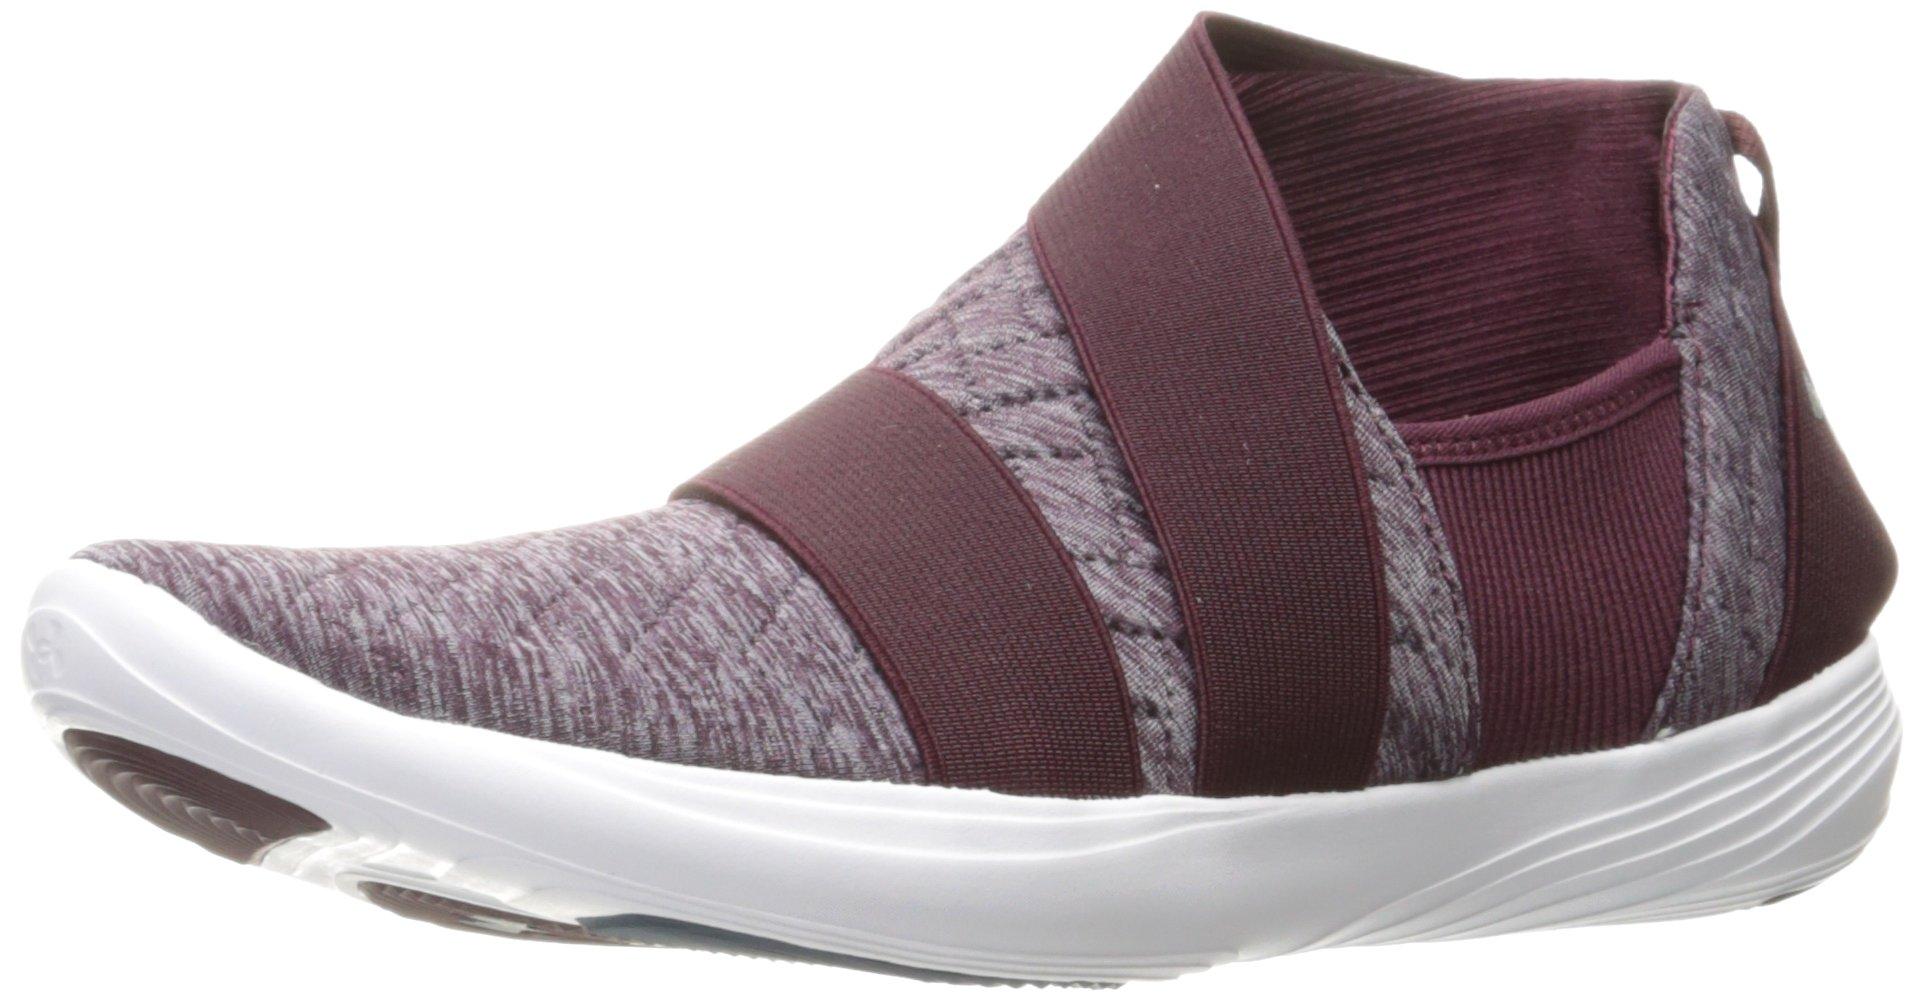 Under Armour Women's Street Precision Slip Metallic Sneaker, Raisin Red (916)/Raisin Red, 8